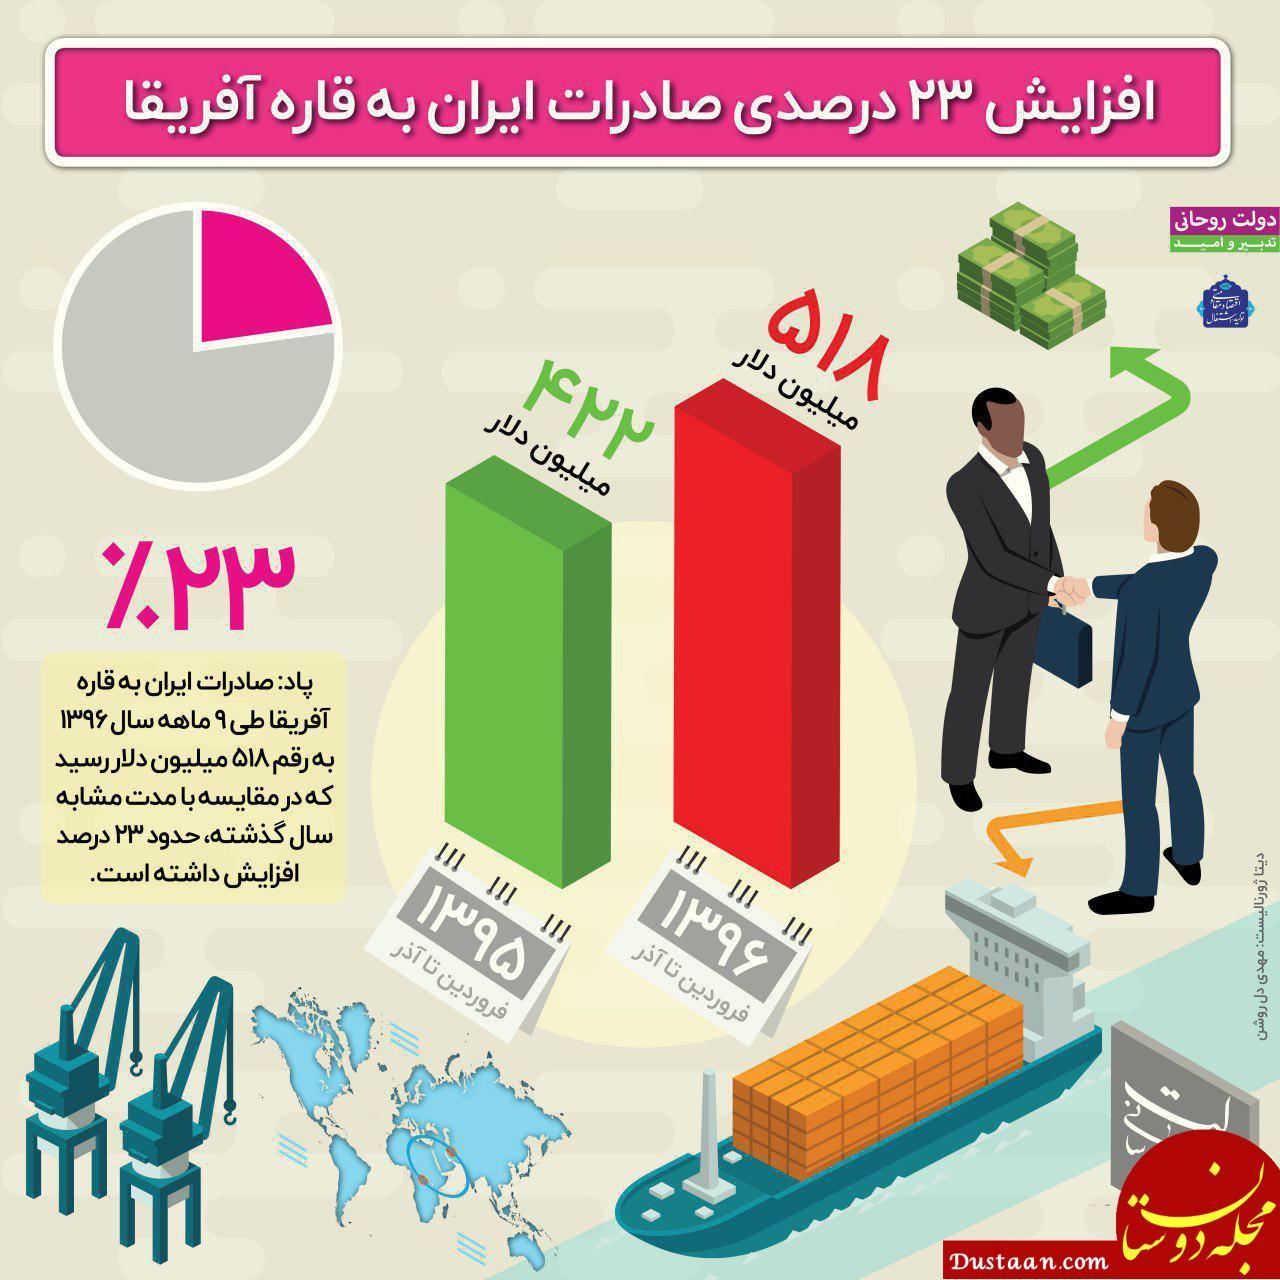 www.dustaan.com افزایش 23 درصدی صادرات ایران به قاره آفریقا +اینفوگرافیک